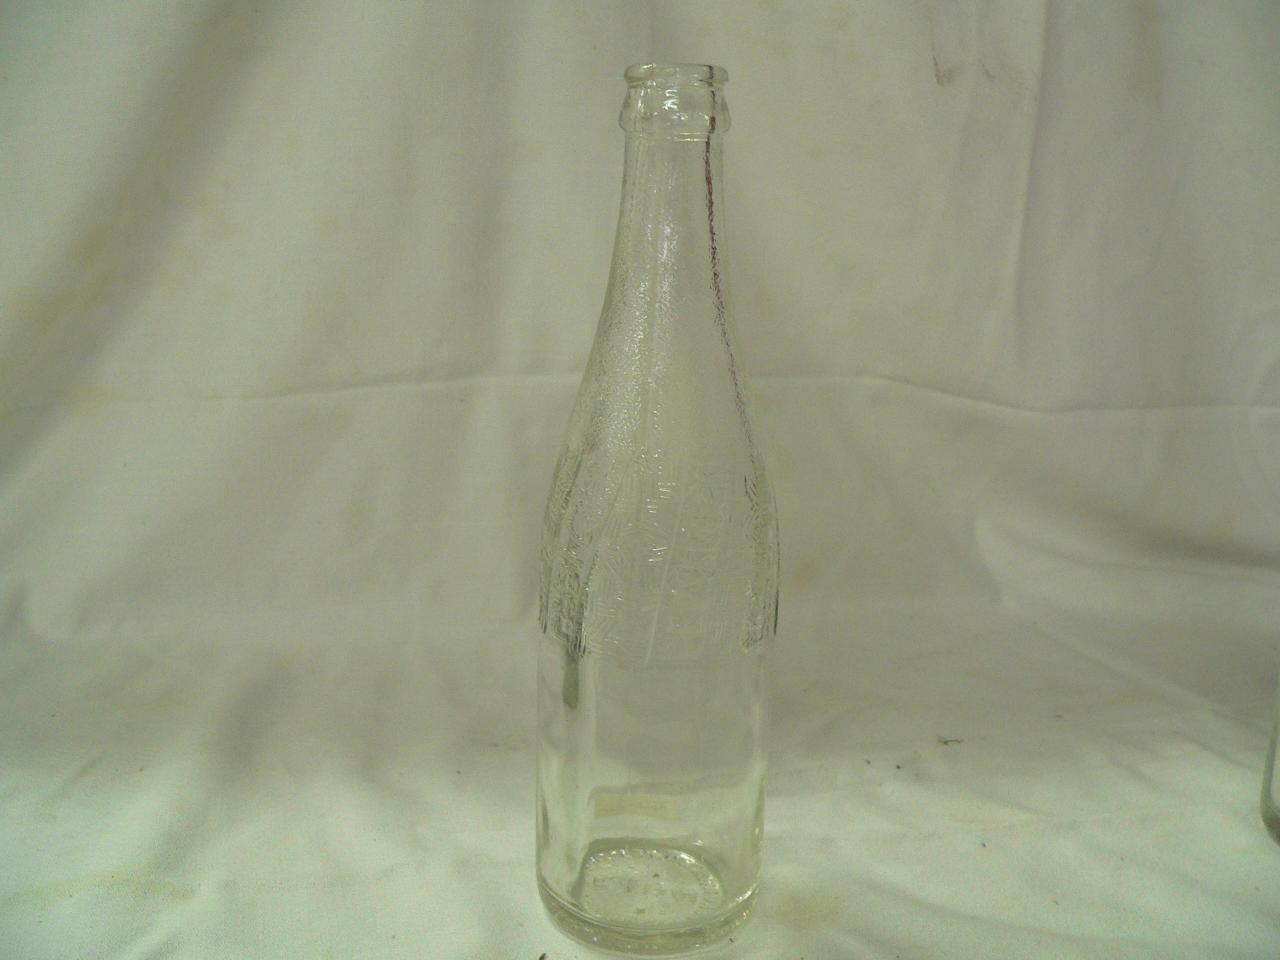 Bouteille antique pepsi cola # 3612.1